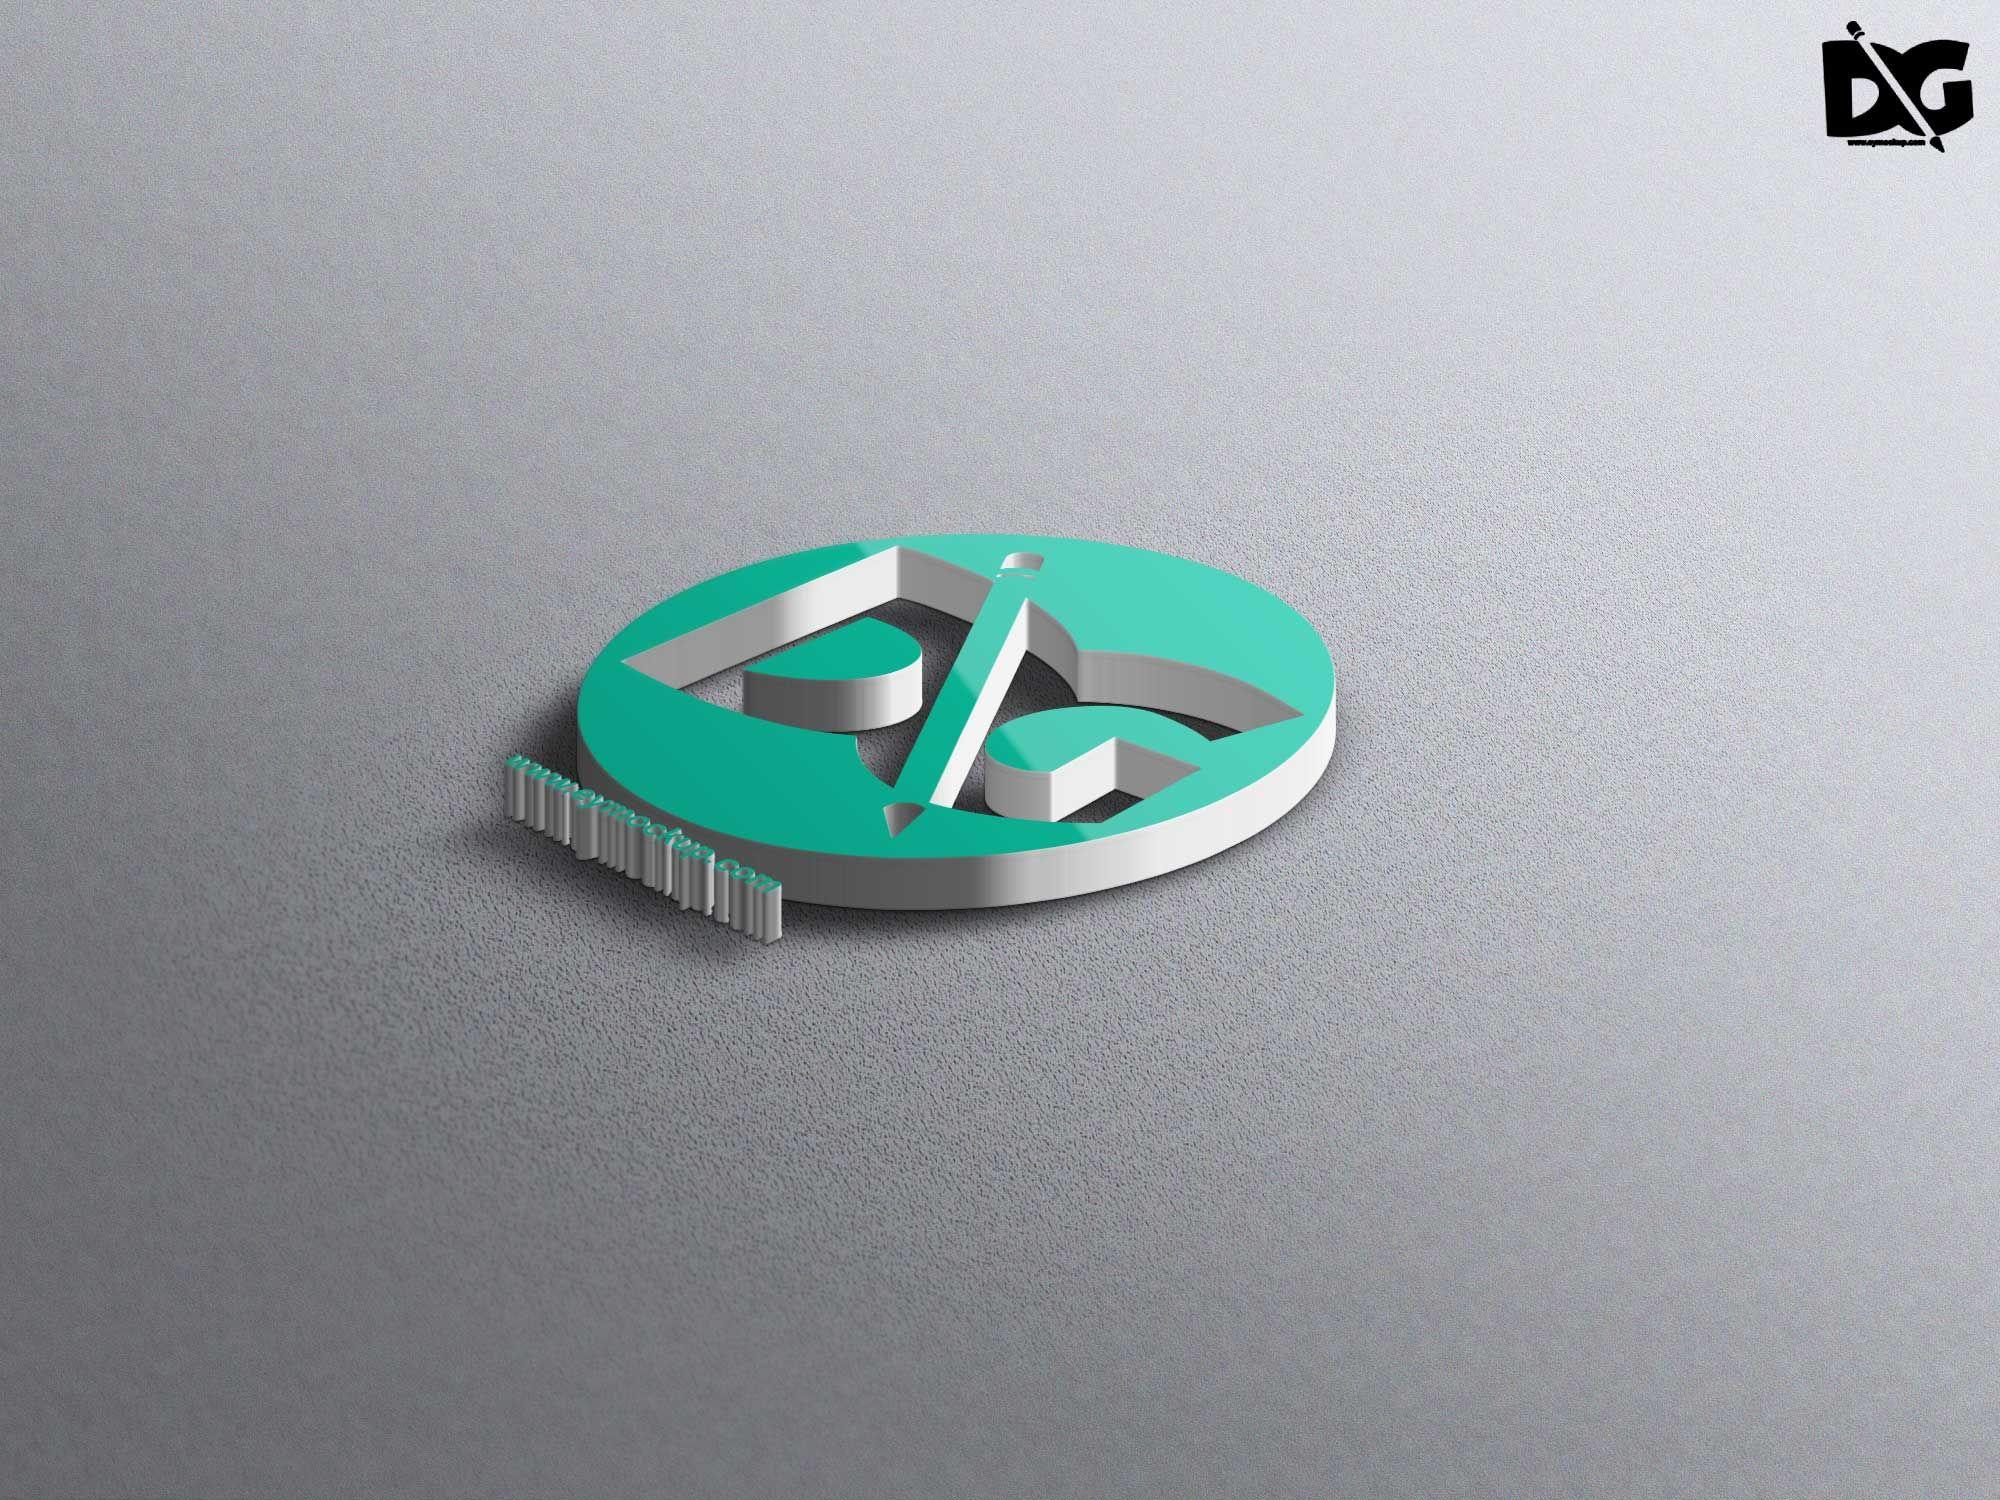 Free Pvc 3d Logo Mockups Psd Free Logo Mockup Psd Logo Mockups Psd Logo Mockup